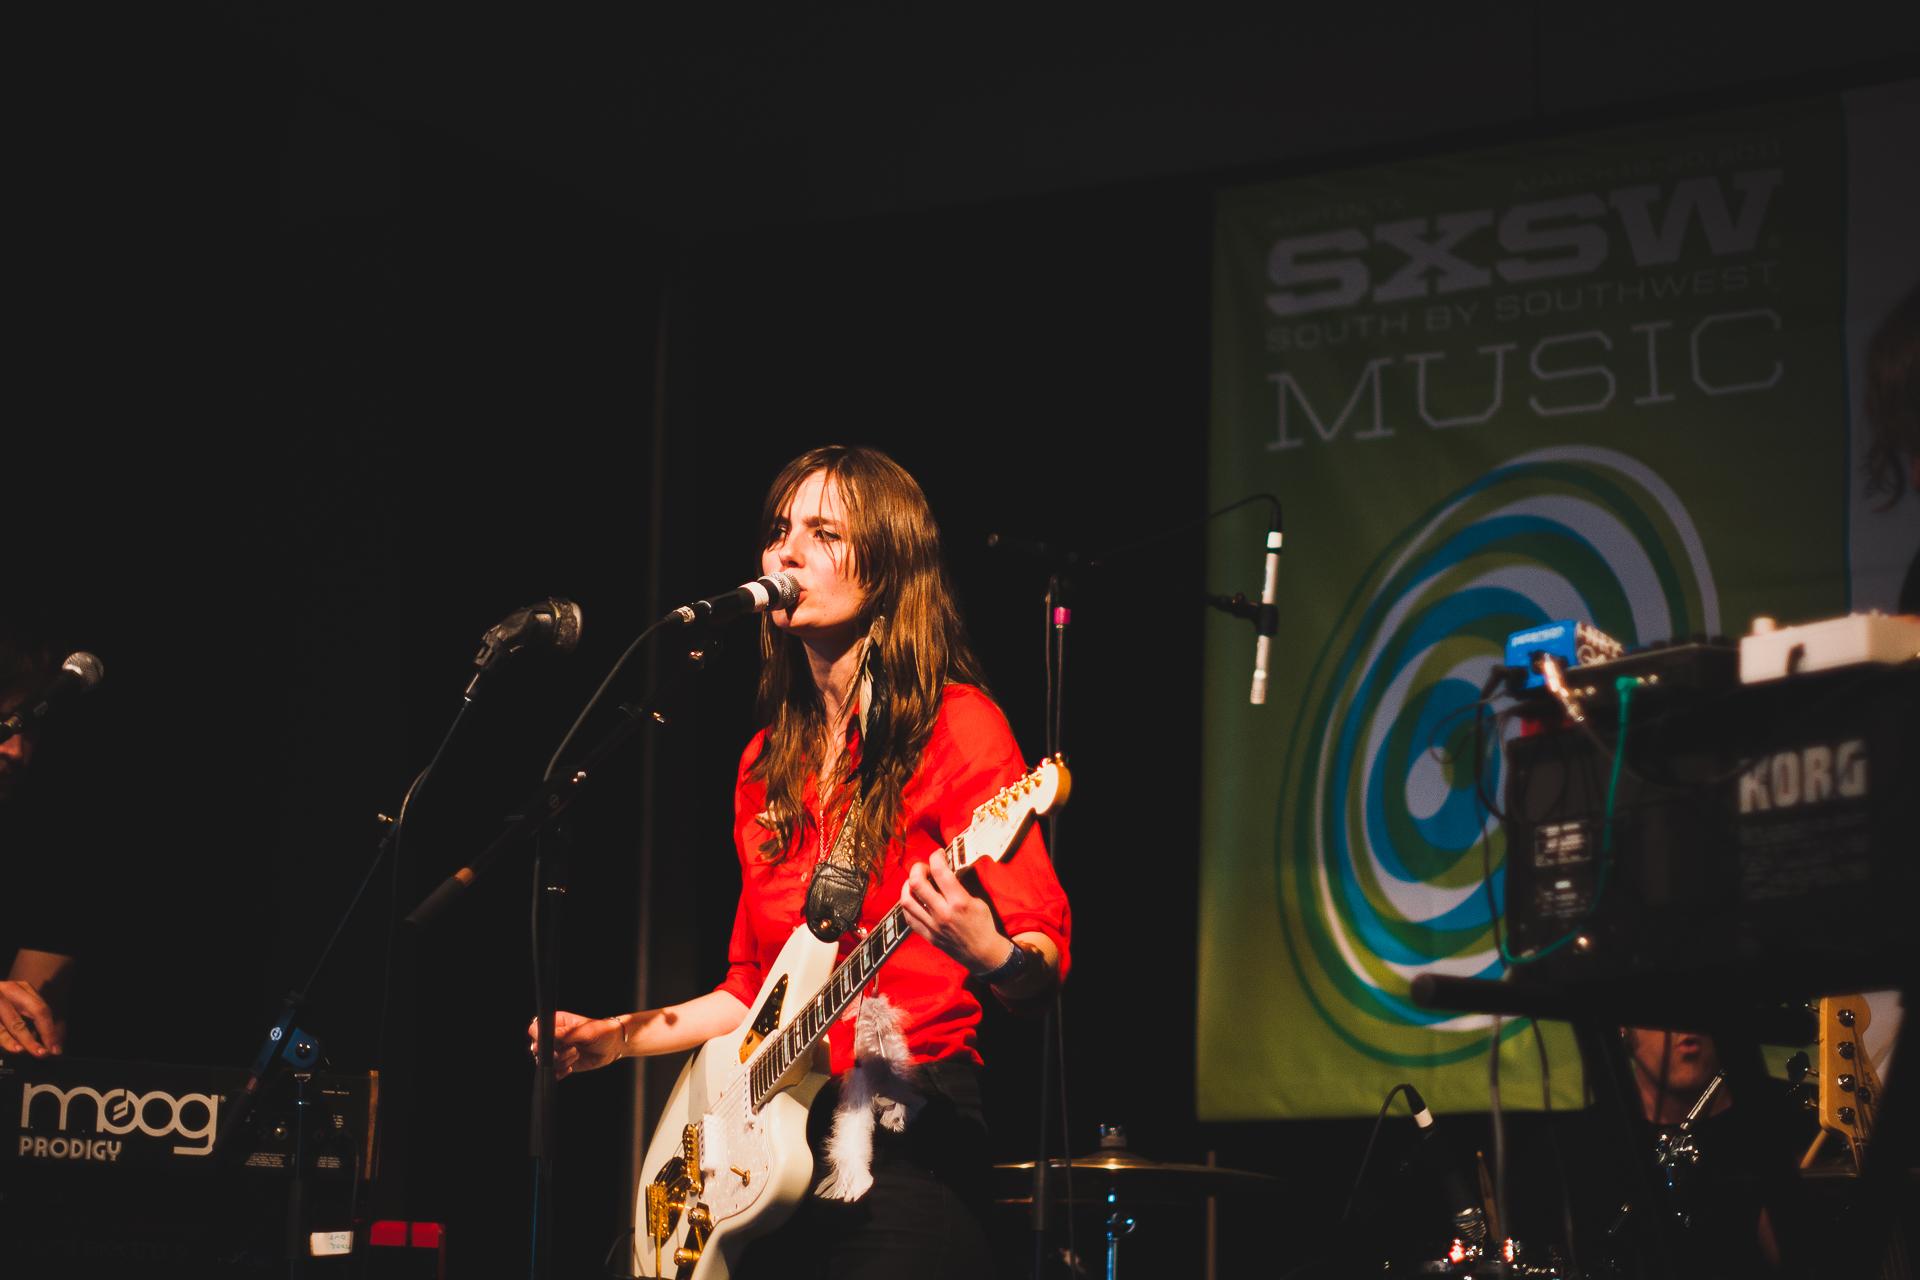 SXSW Music 2011